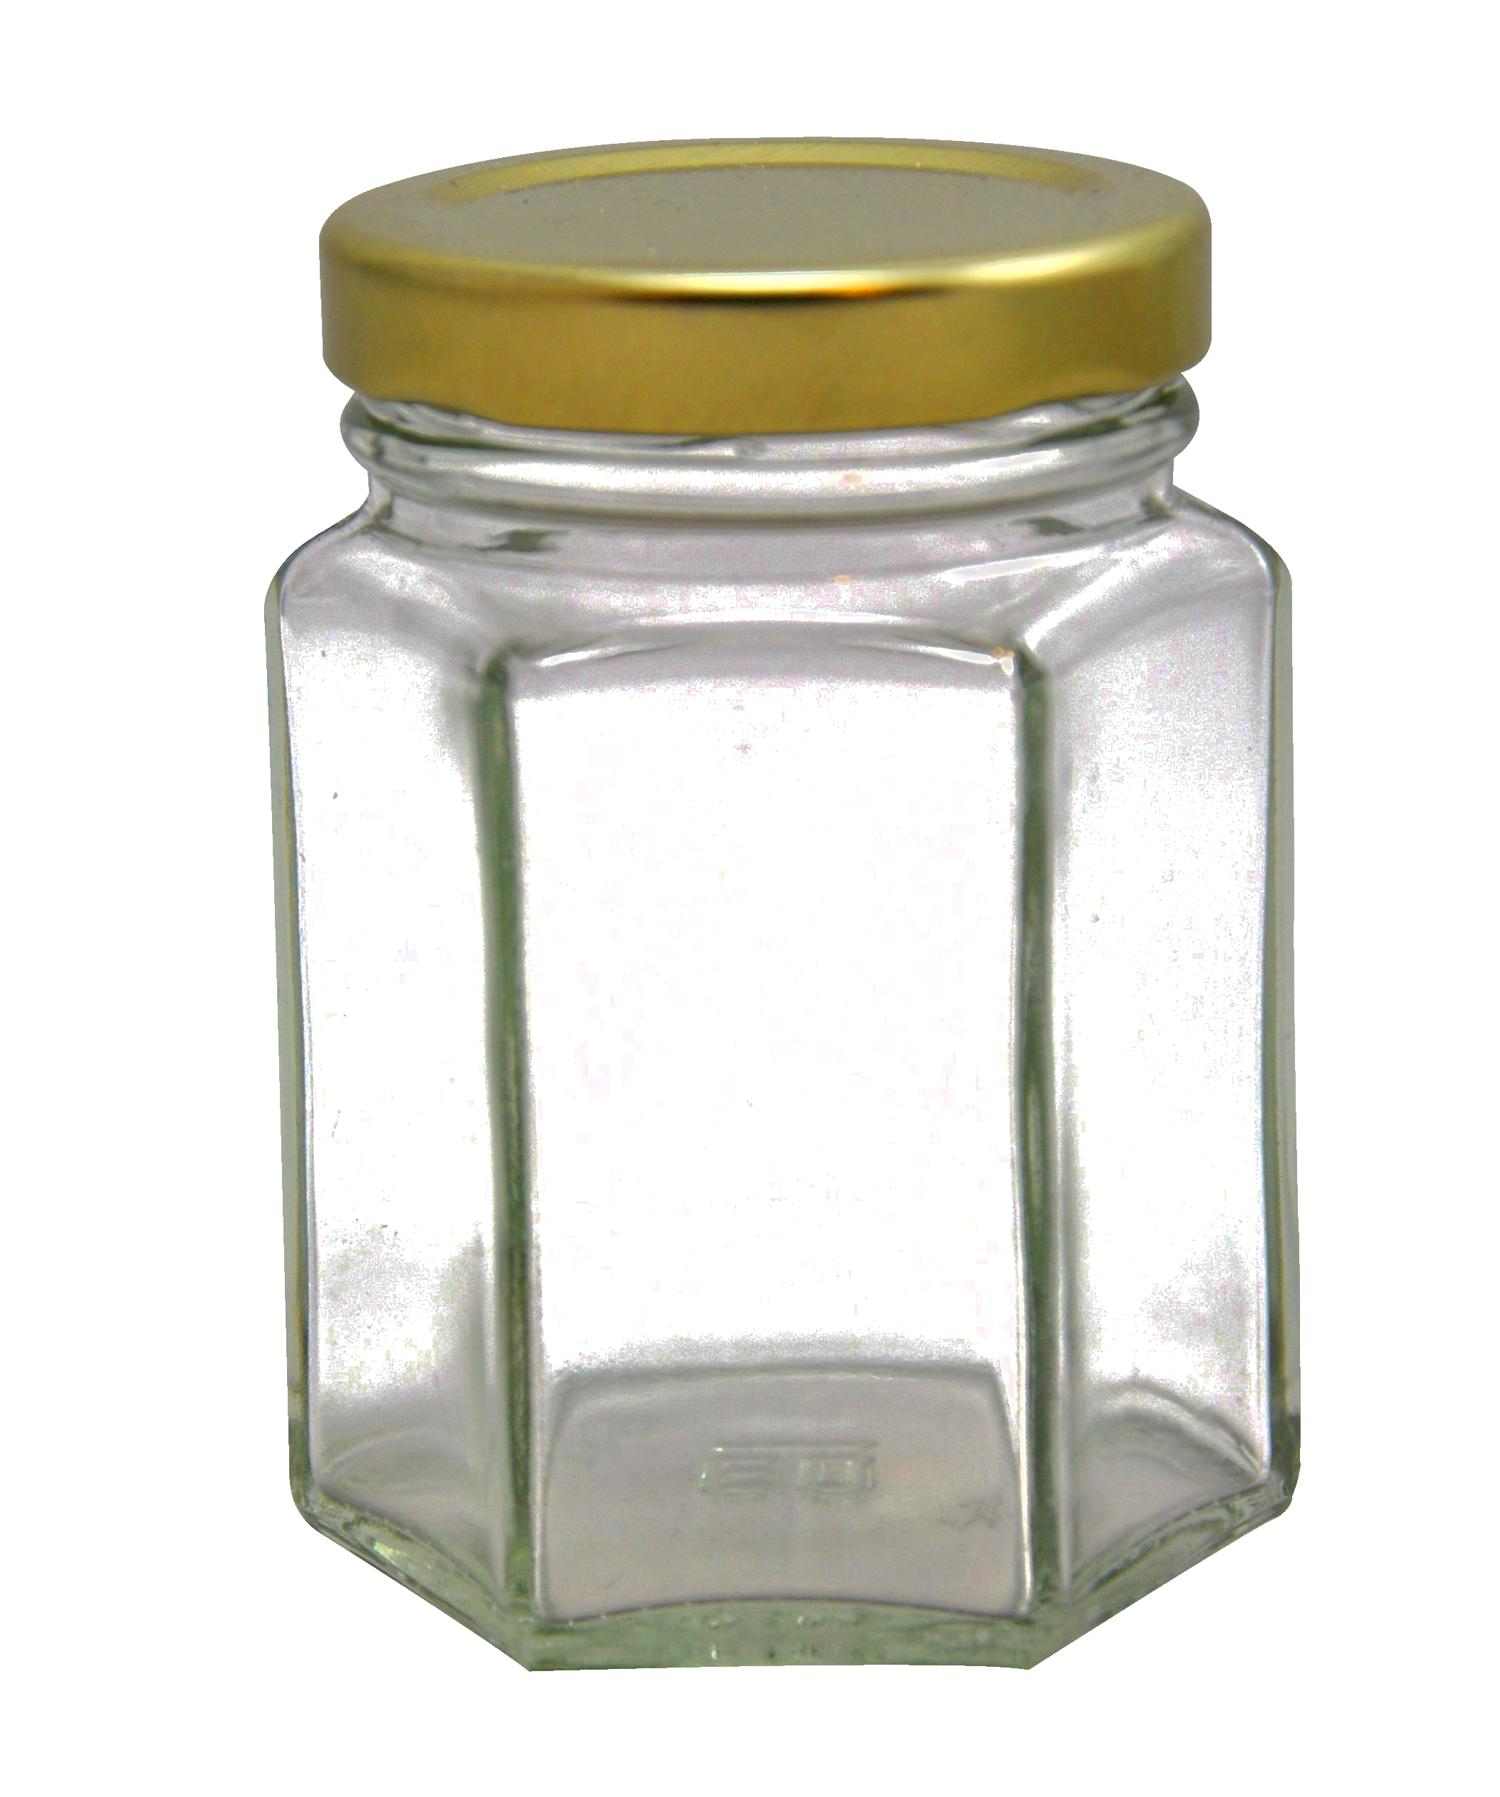 clip download Glass jar png image. Transparent object